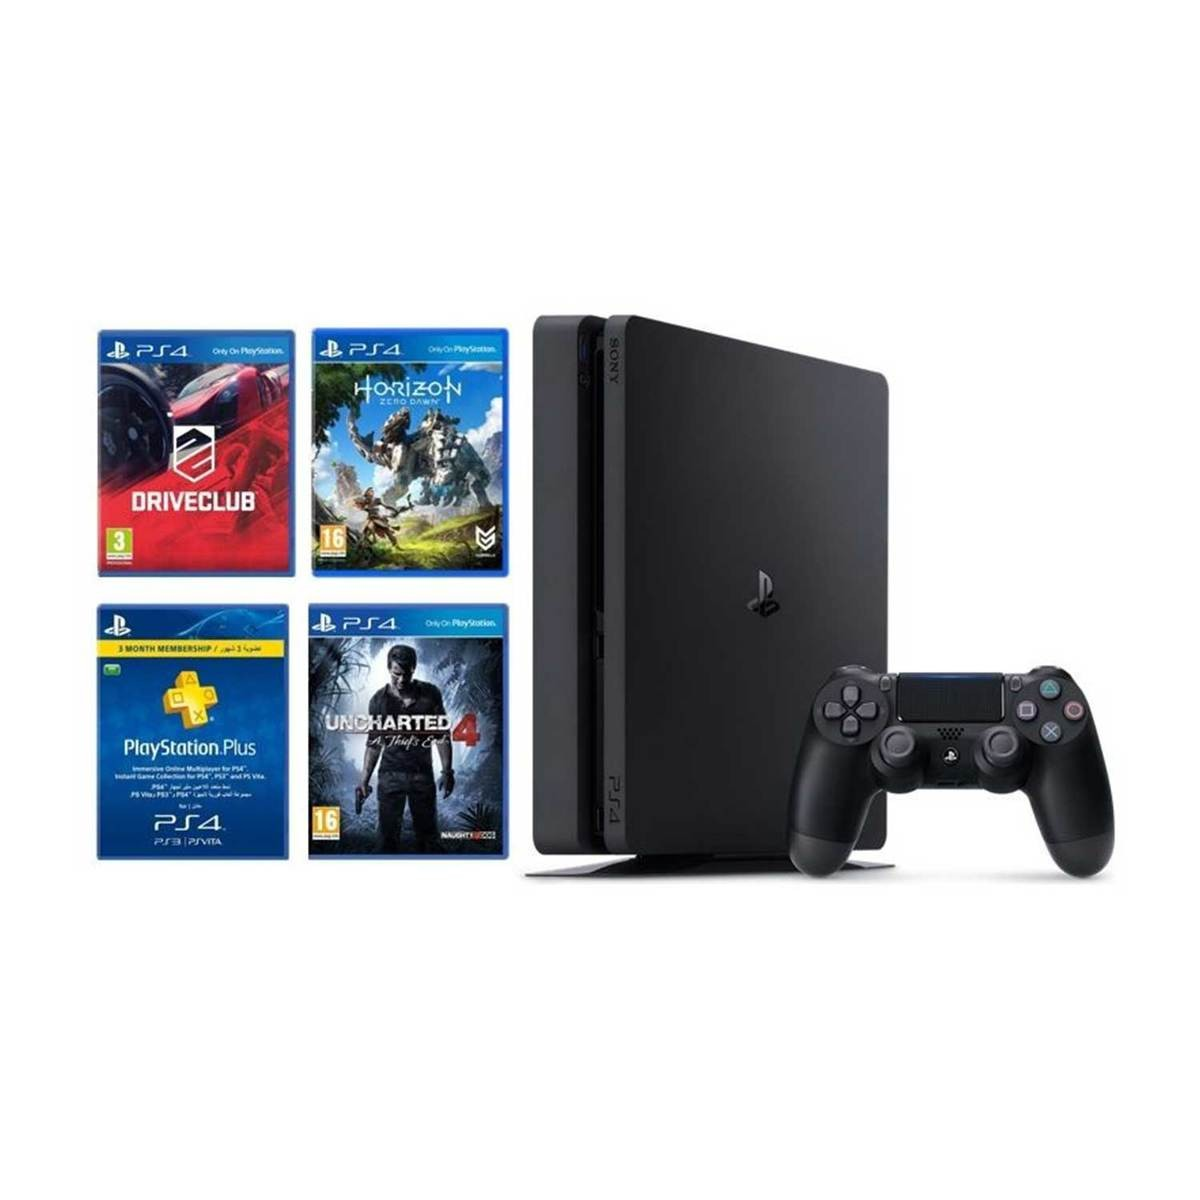 Sony PS4 500 GB + Horizon Zero Down+Uncharted 4+ Drive Club + 3 Month Membership Card